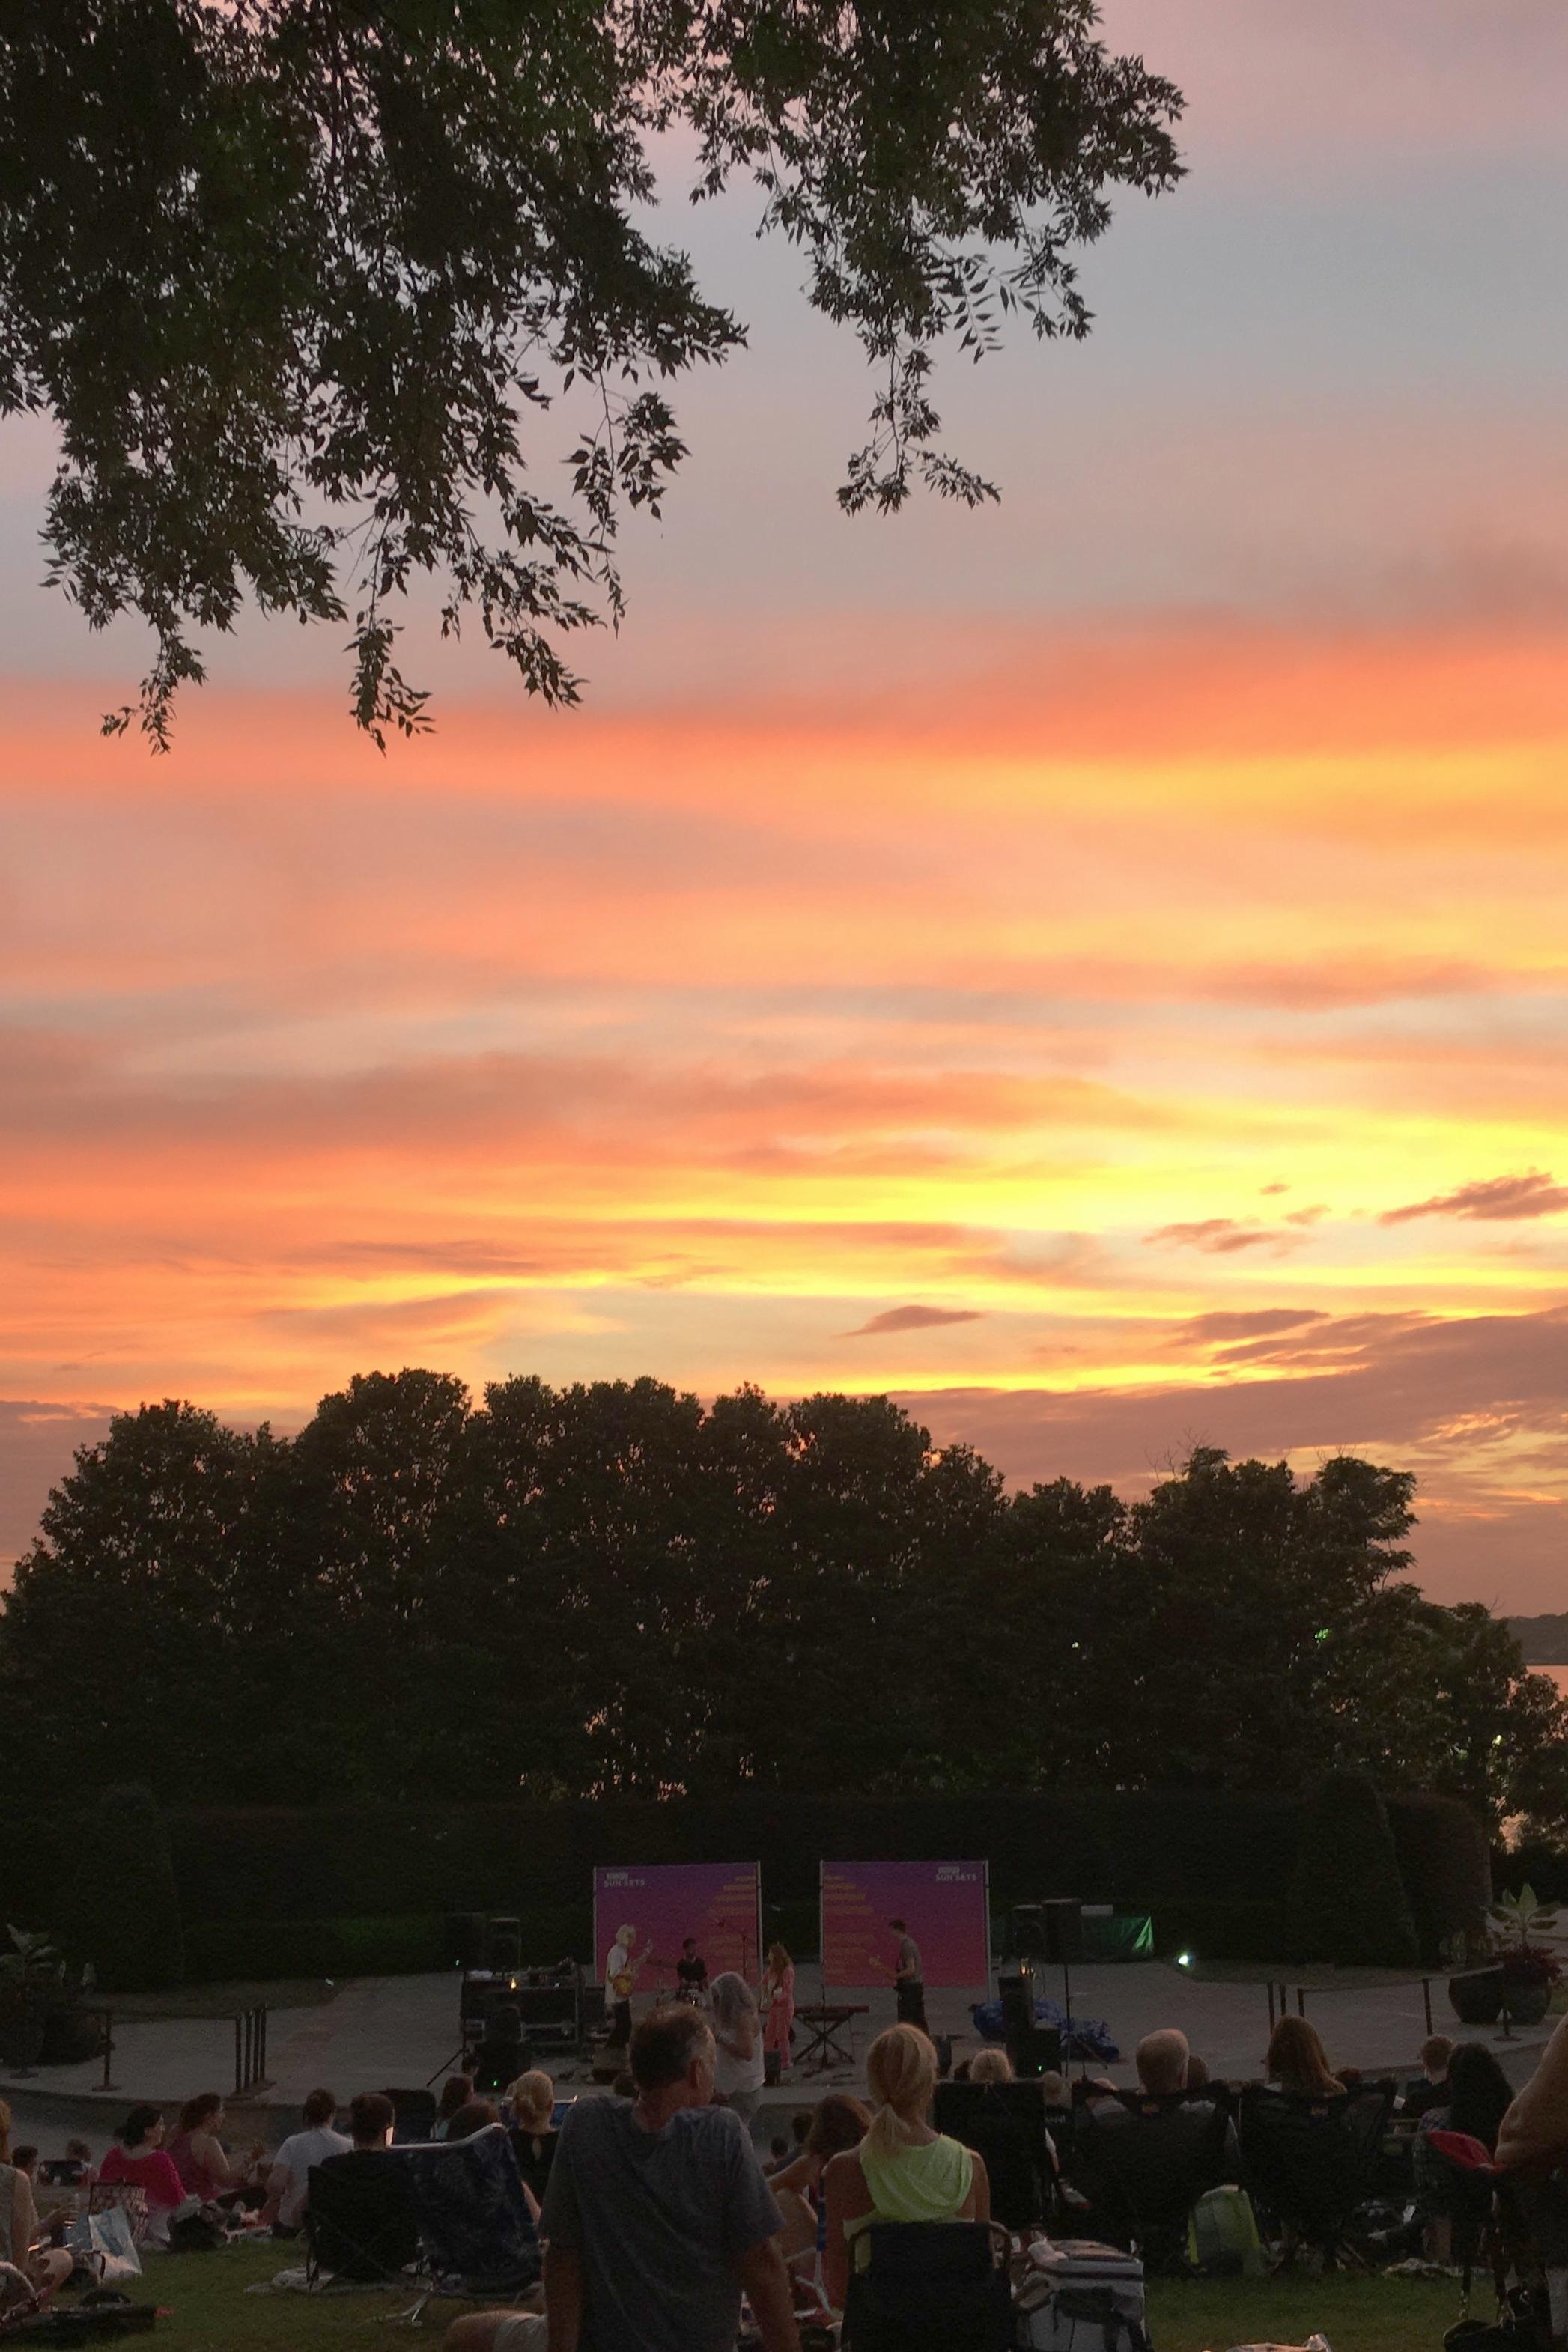 Our view of June Bird's set at the Dallas Arboretum.